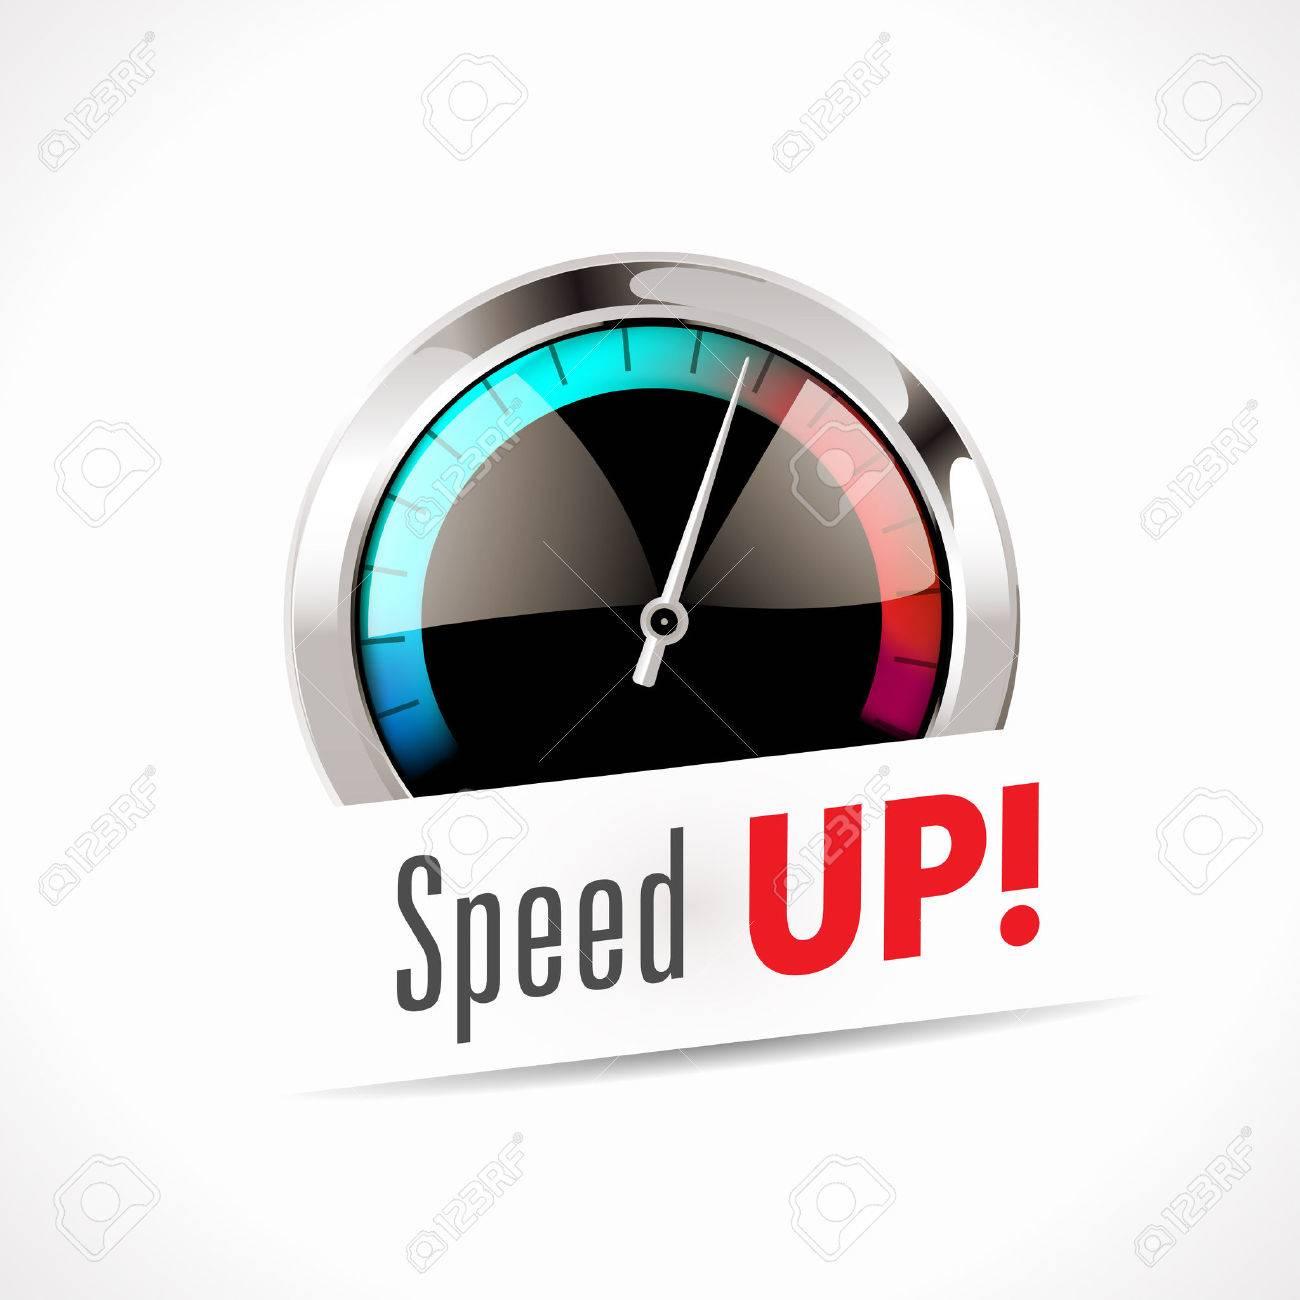 Speedometer - Speed Up! - 48523551